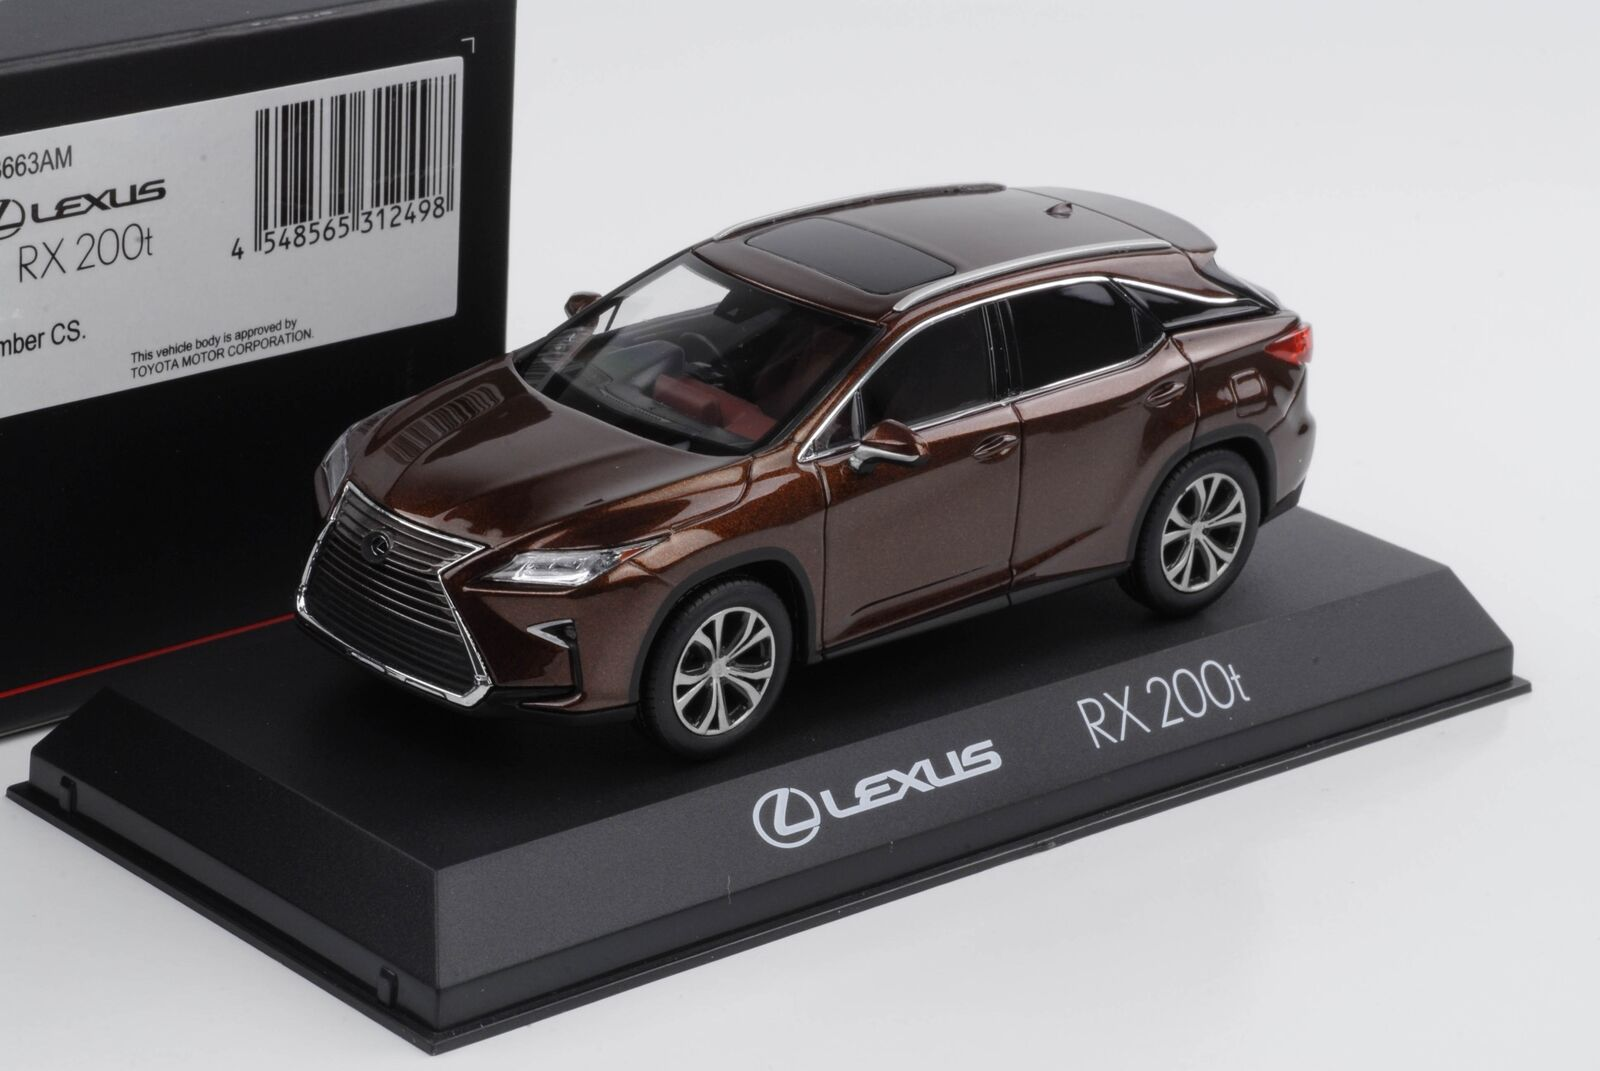 Lexus Rx 200t F Sport Amber Crystal Toyota 1 43 Kyosho Diecast